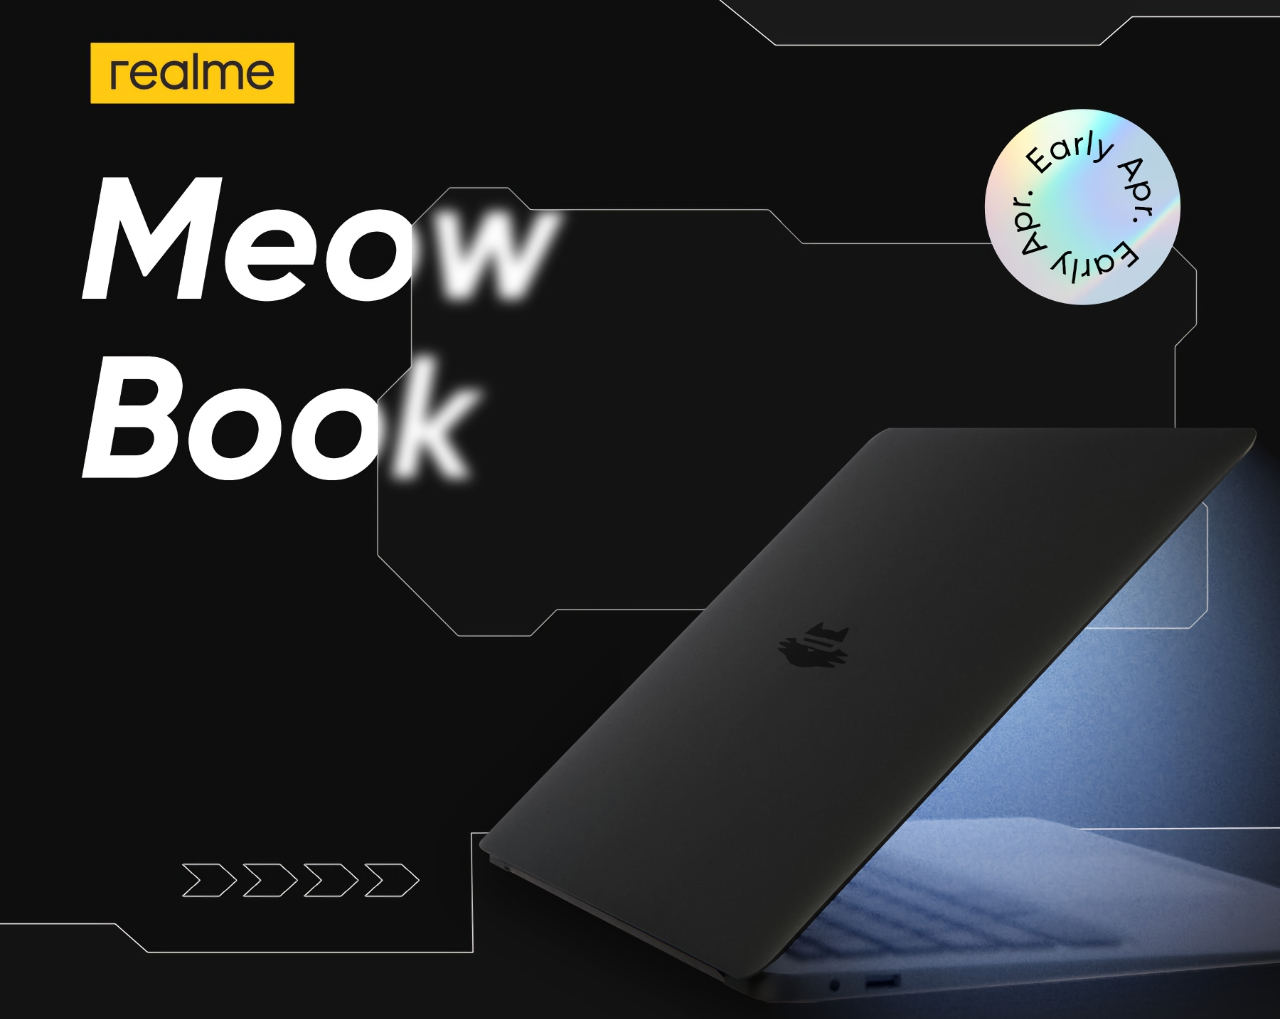 Realme намекнула на разработку фирменного ноутбука